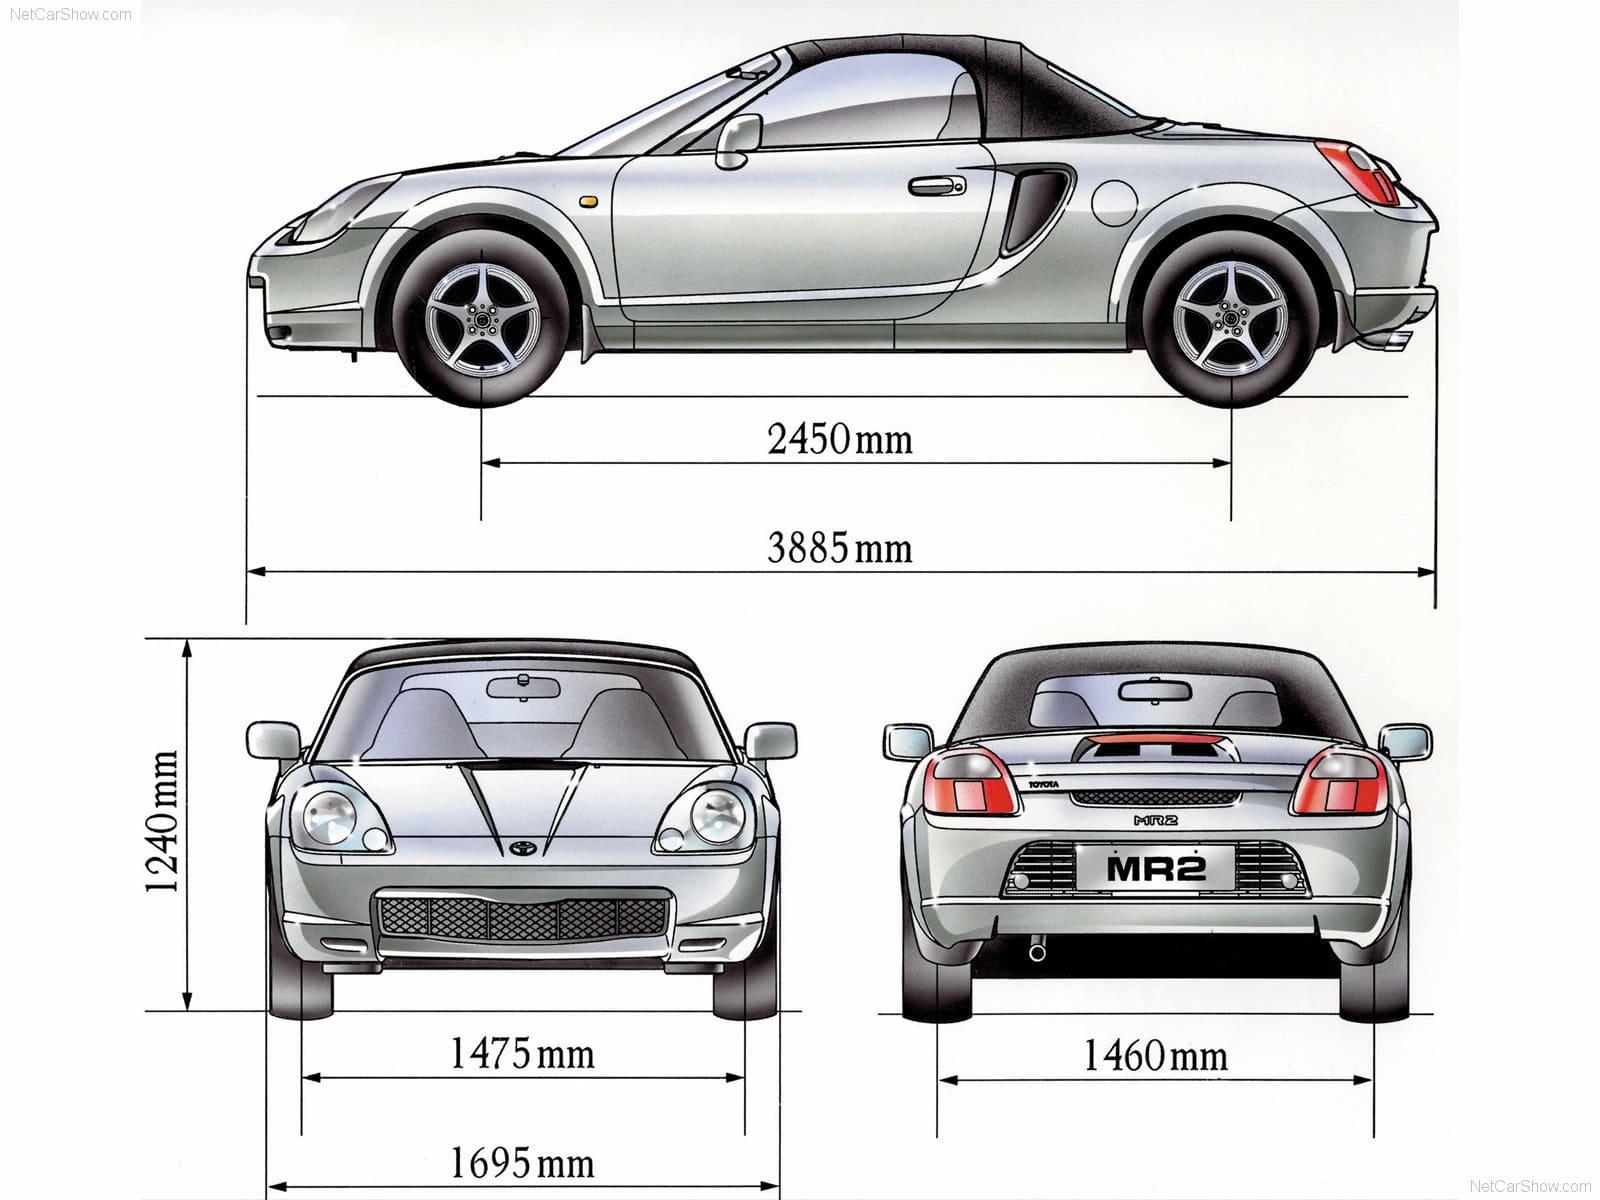 Toyota MR2, Toyota, MR2, roadster, motoring, automotive, convertible, sports car, classic car, retro car, car, cars, Adrian Flux, Not 2 Grand, www.not2grand.co.uk, ebay, ebay motors, autotrader, featured